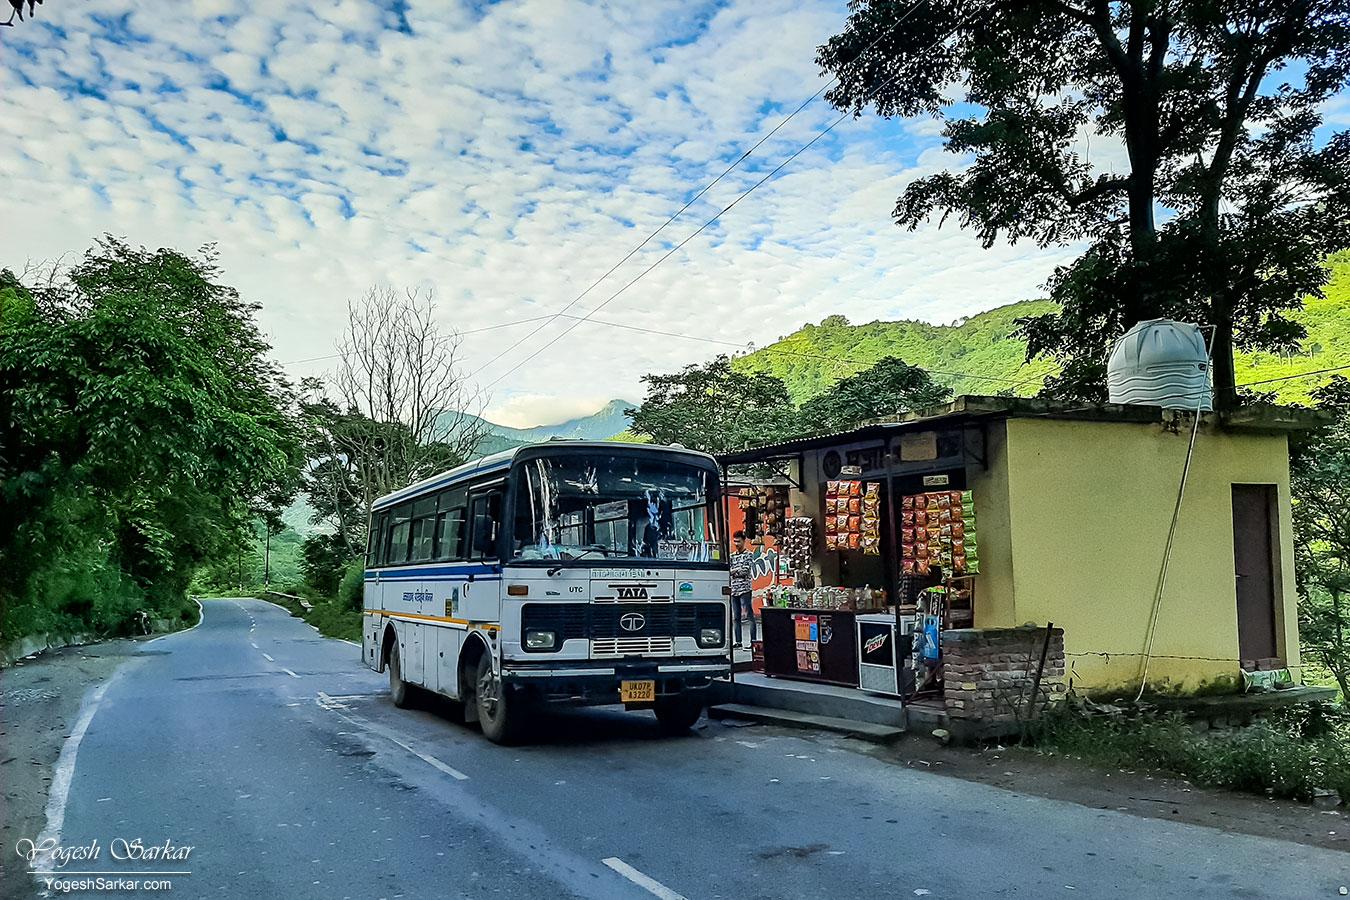 09-utc-bus.jpg